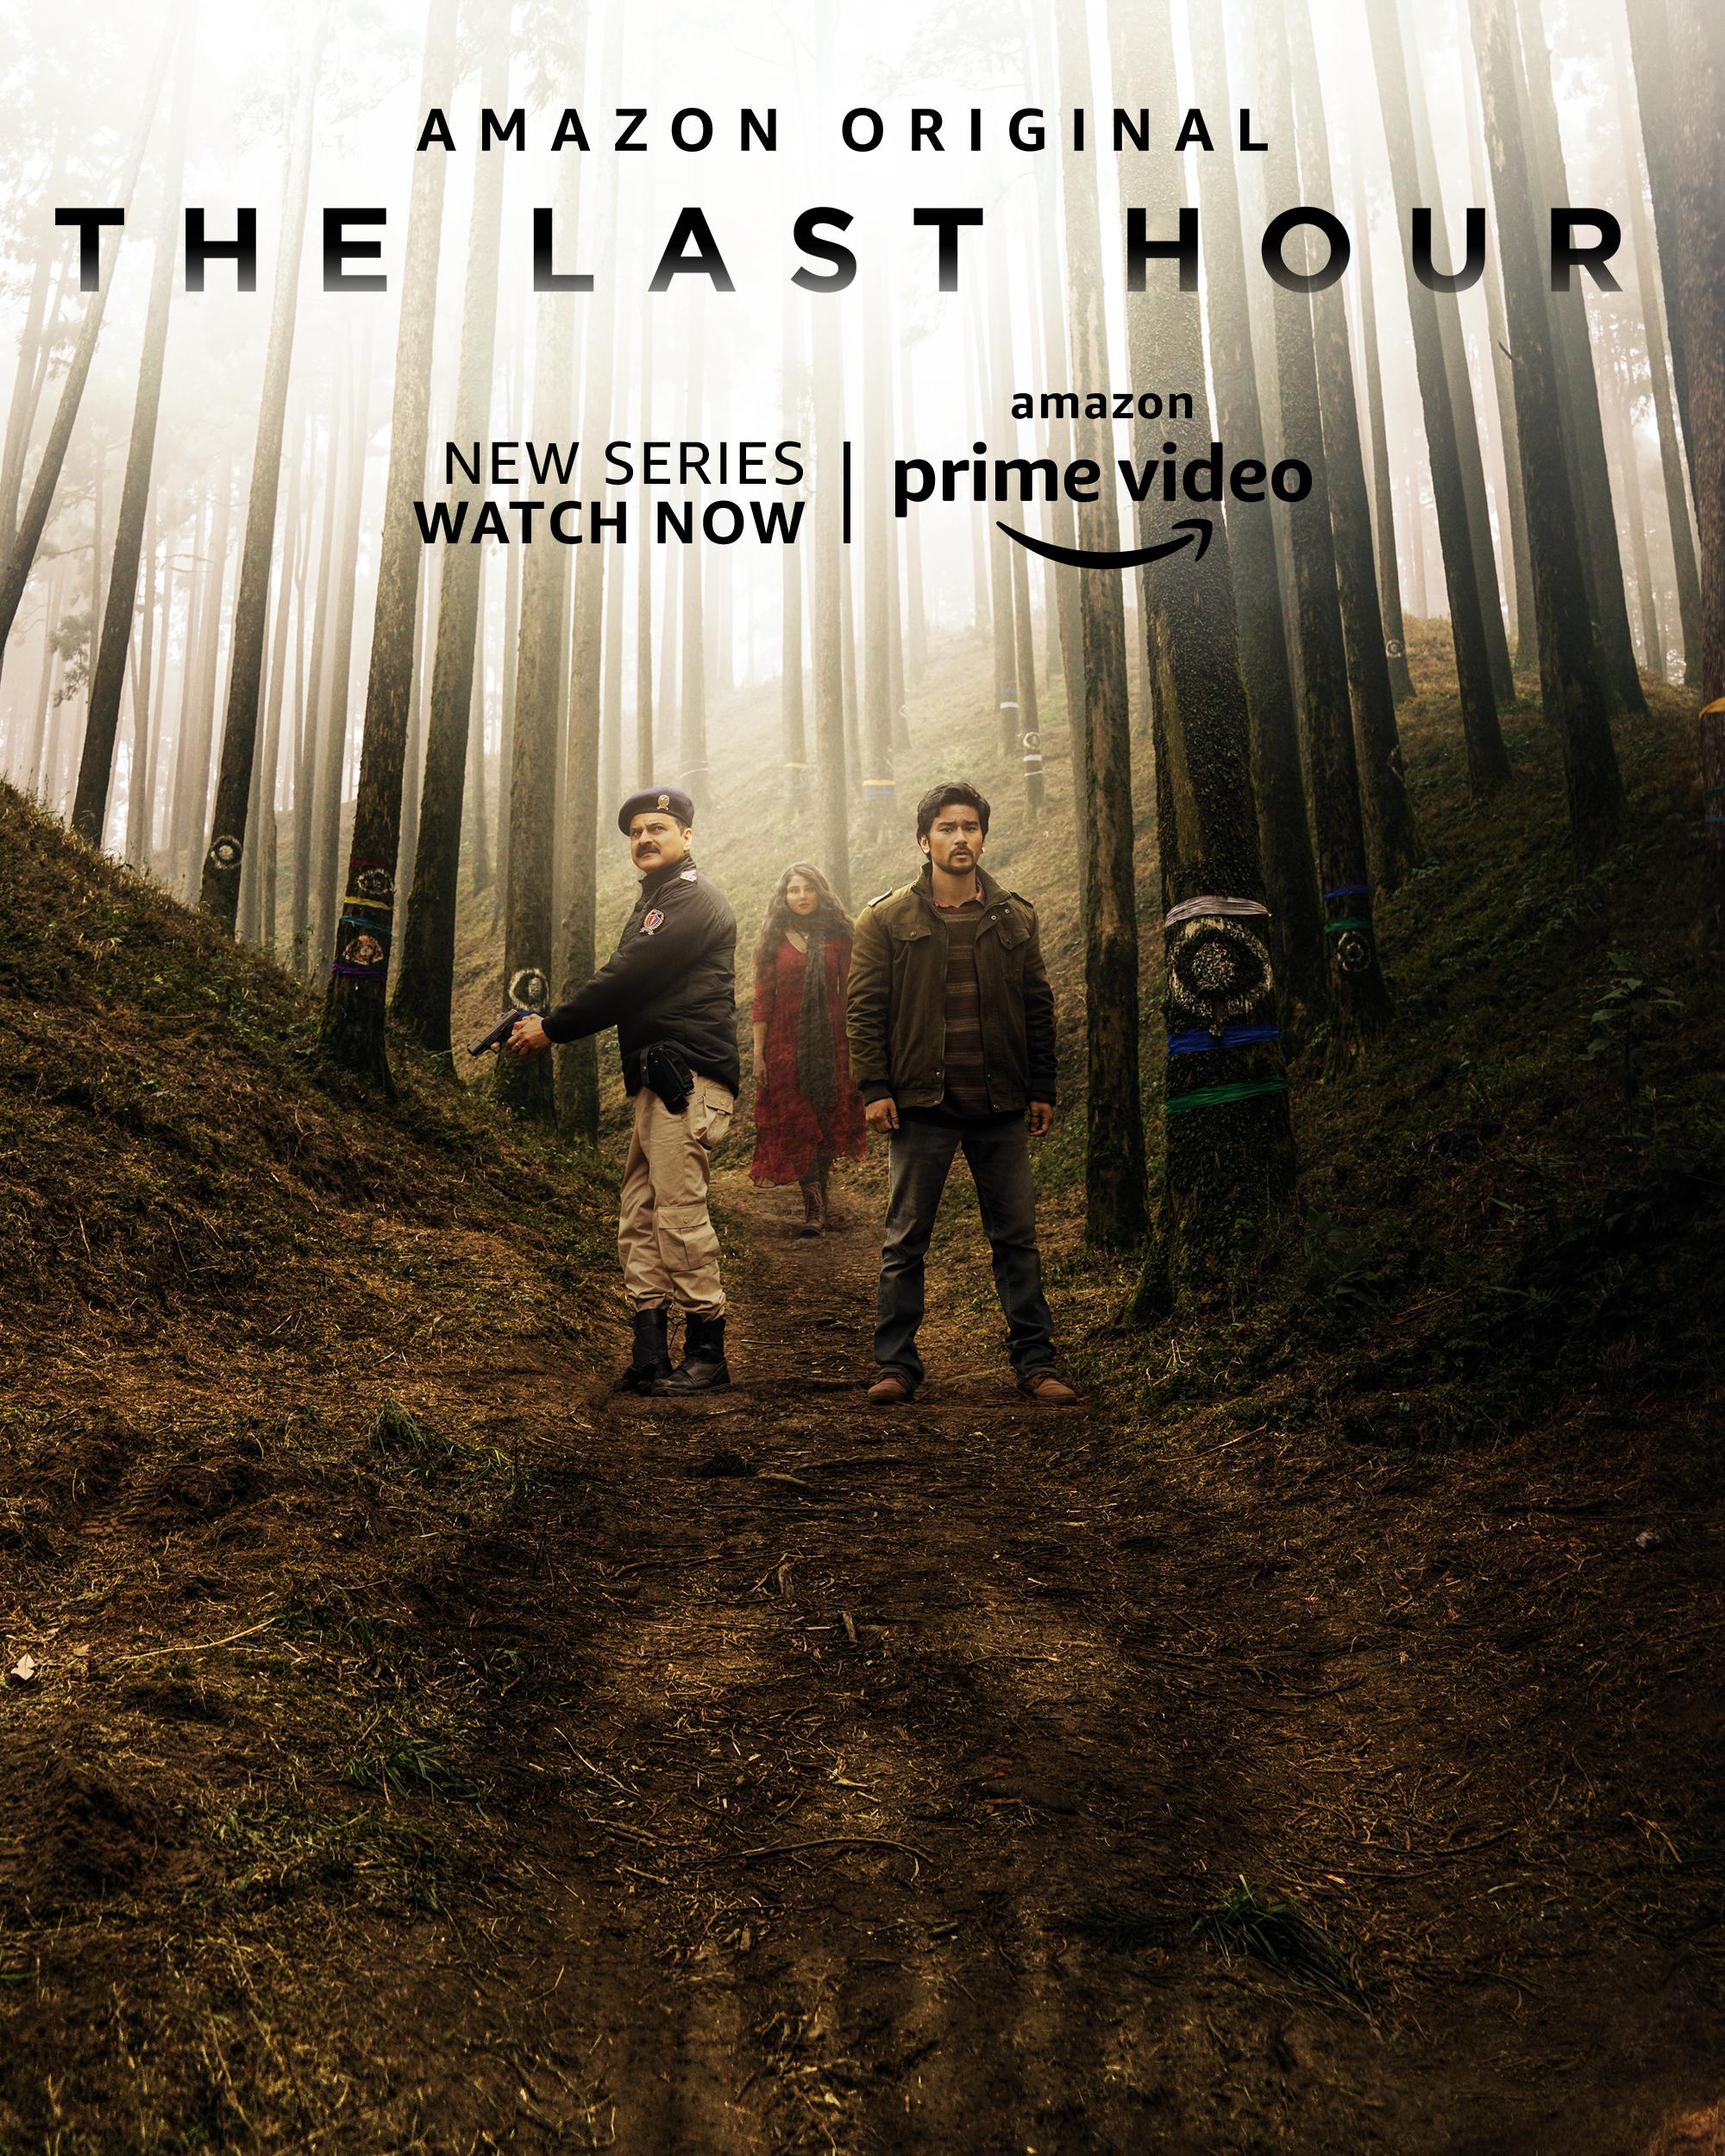 Download The Last Hour S1 2021 Hindi hd Free Filmyzilla 720p 1080p